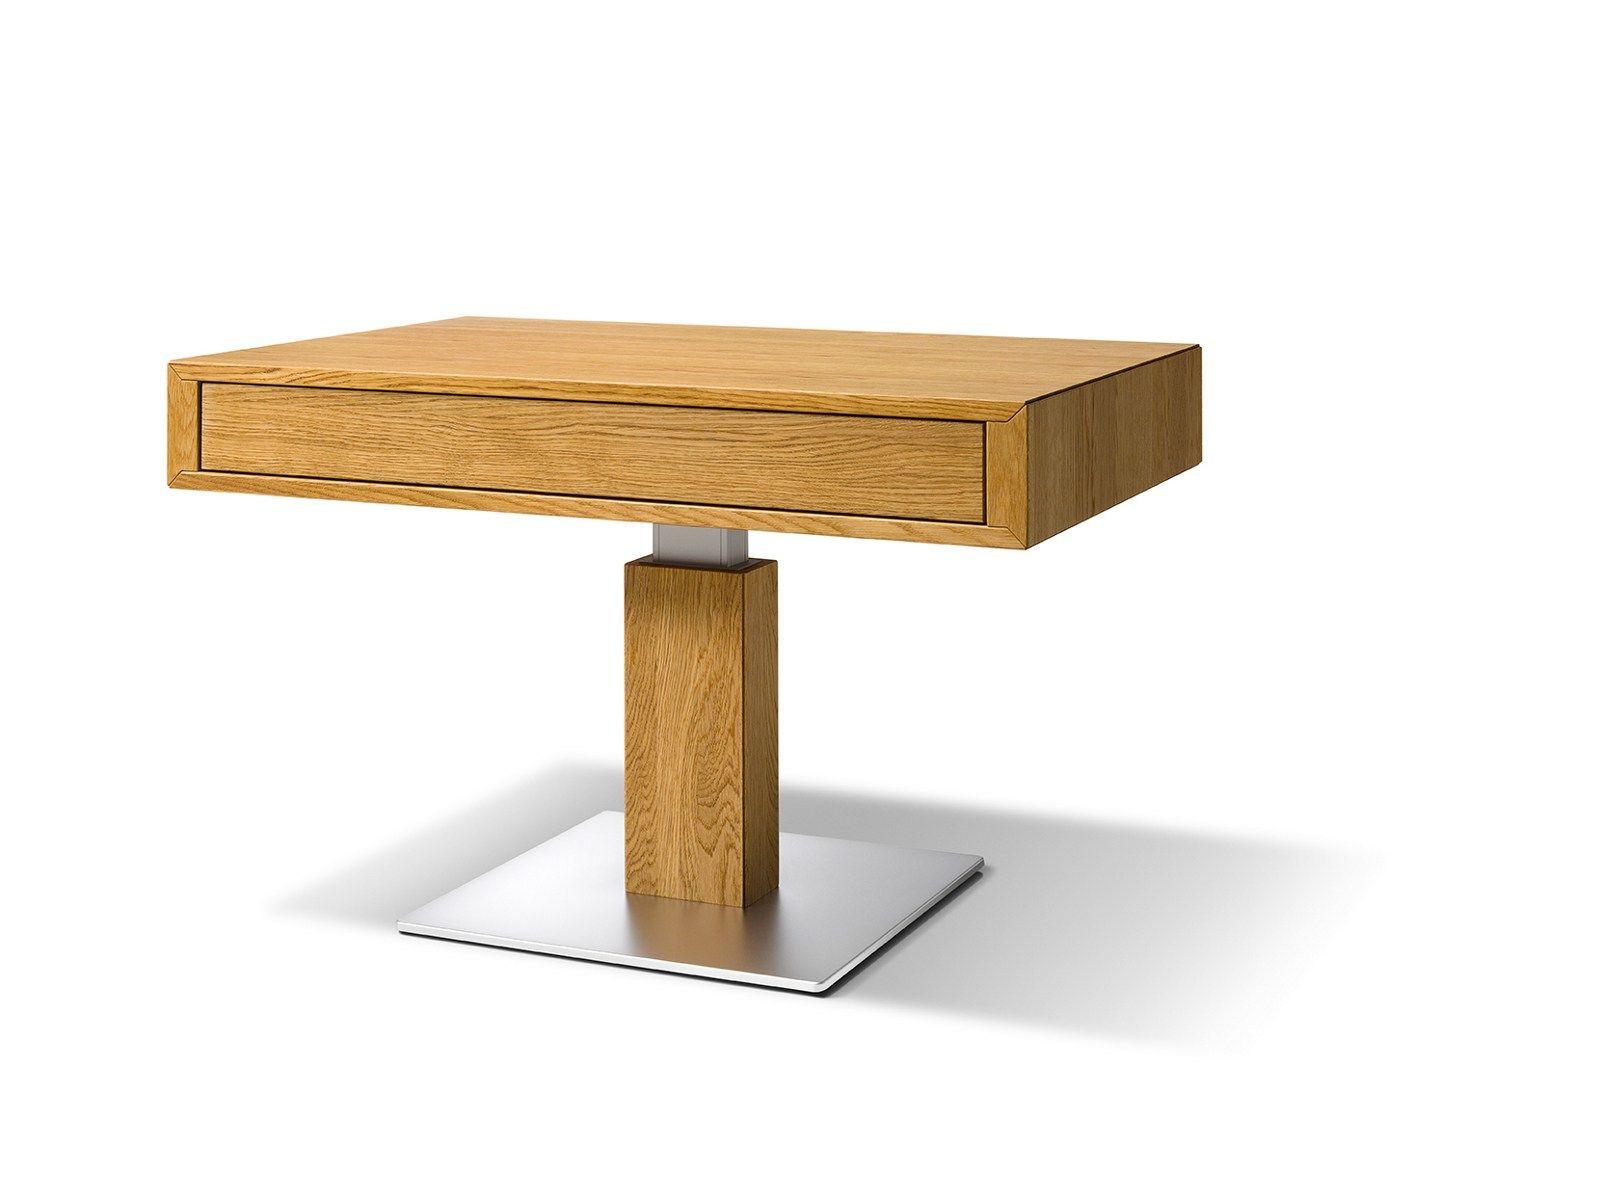 table basse r glable en hauteur lift by team 7 nat rlich. Black Bedroom Furniture Sets. Home Design Ideas